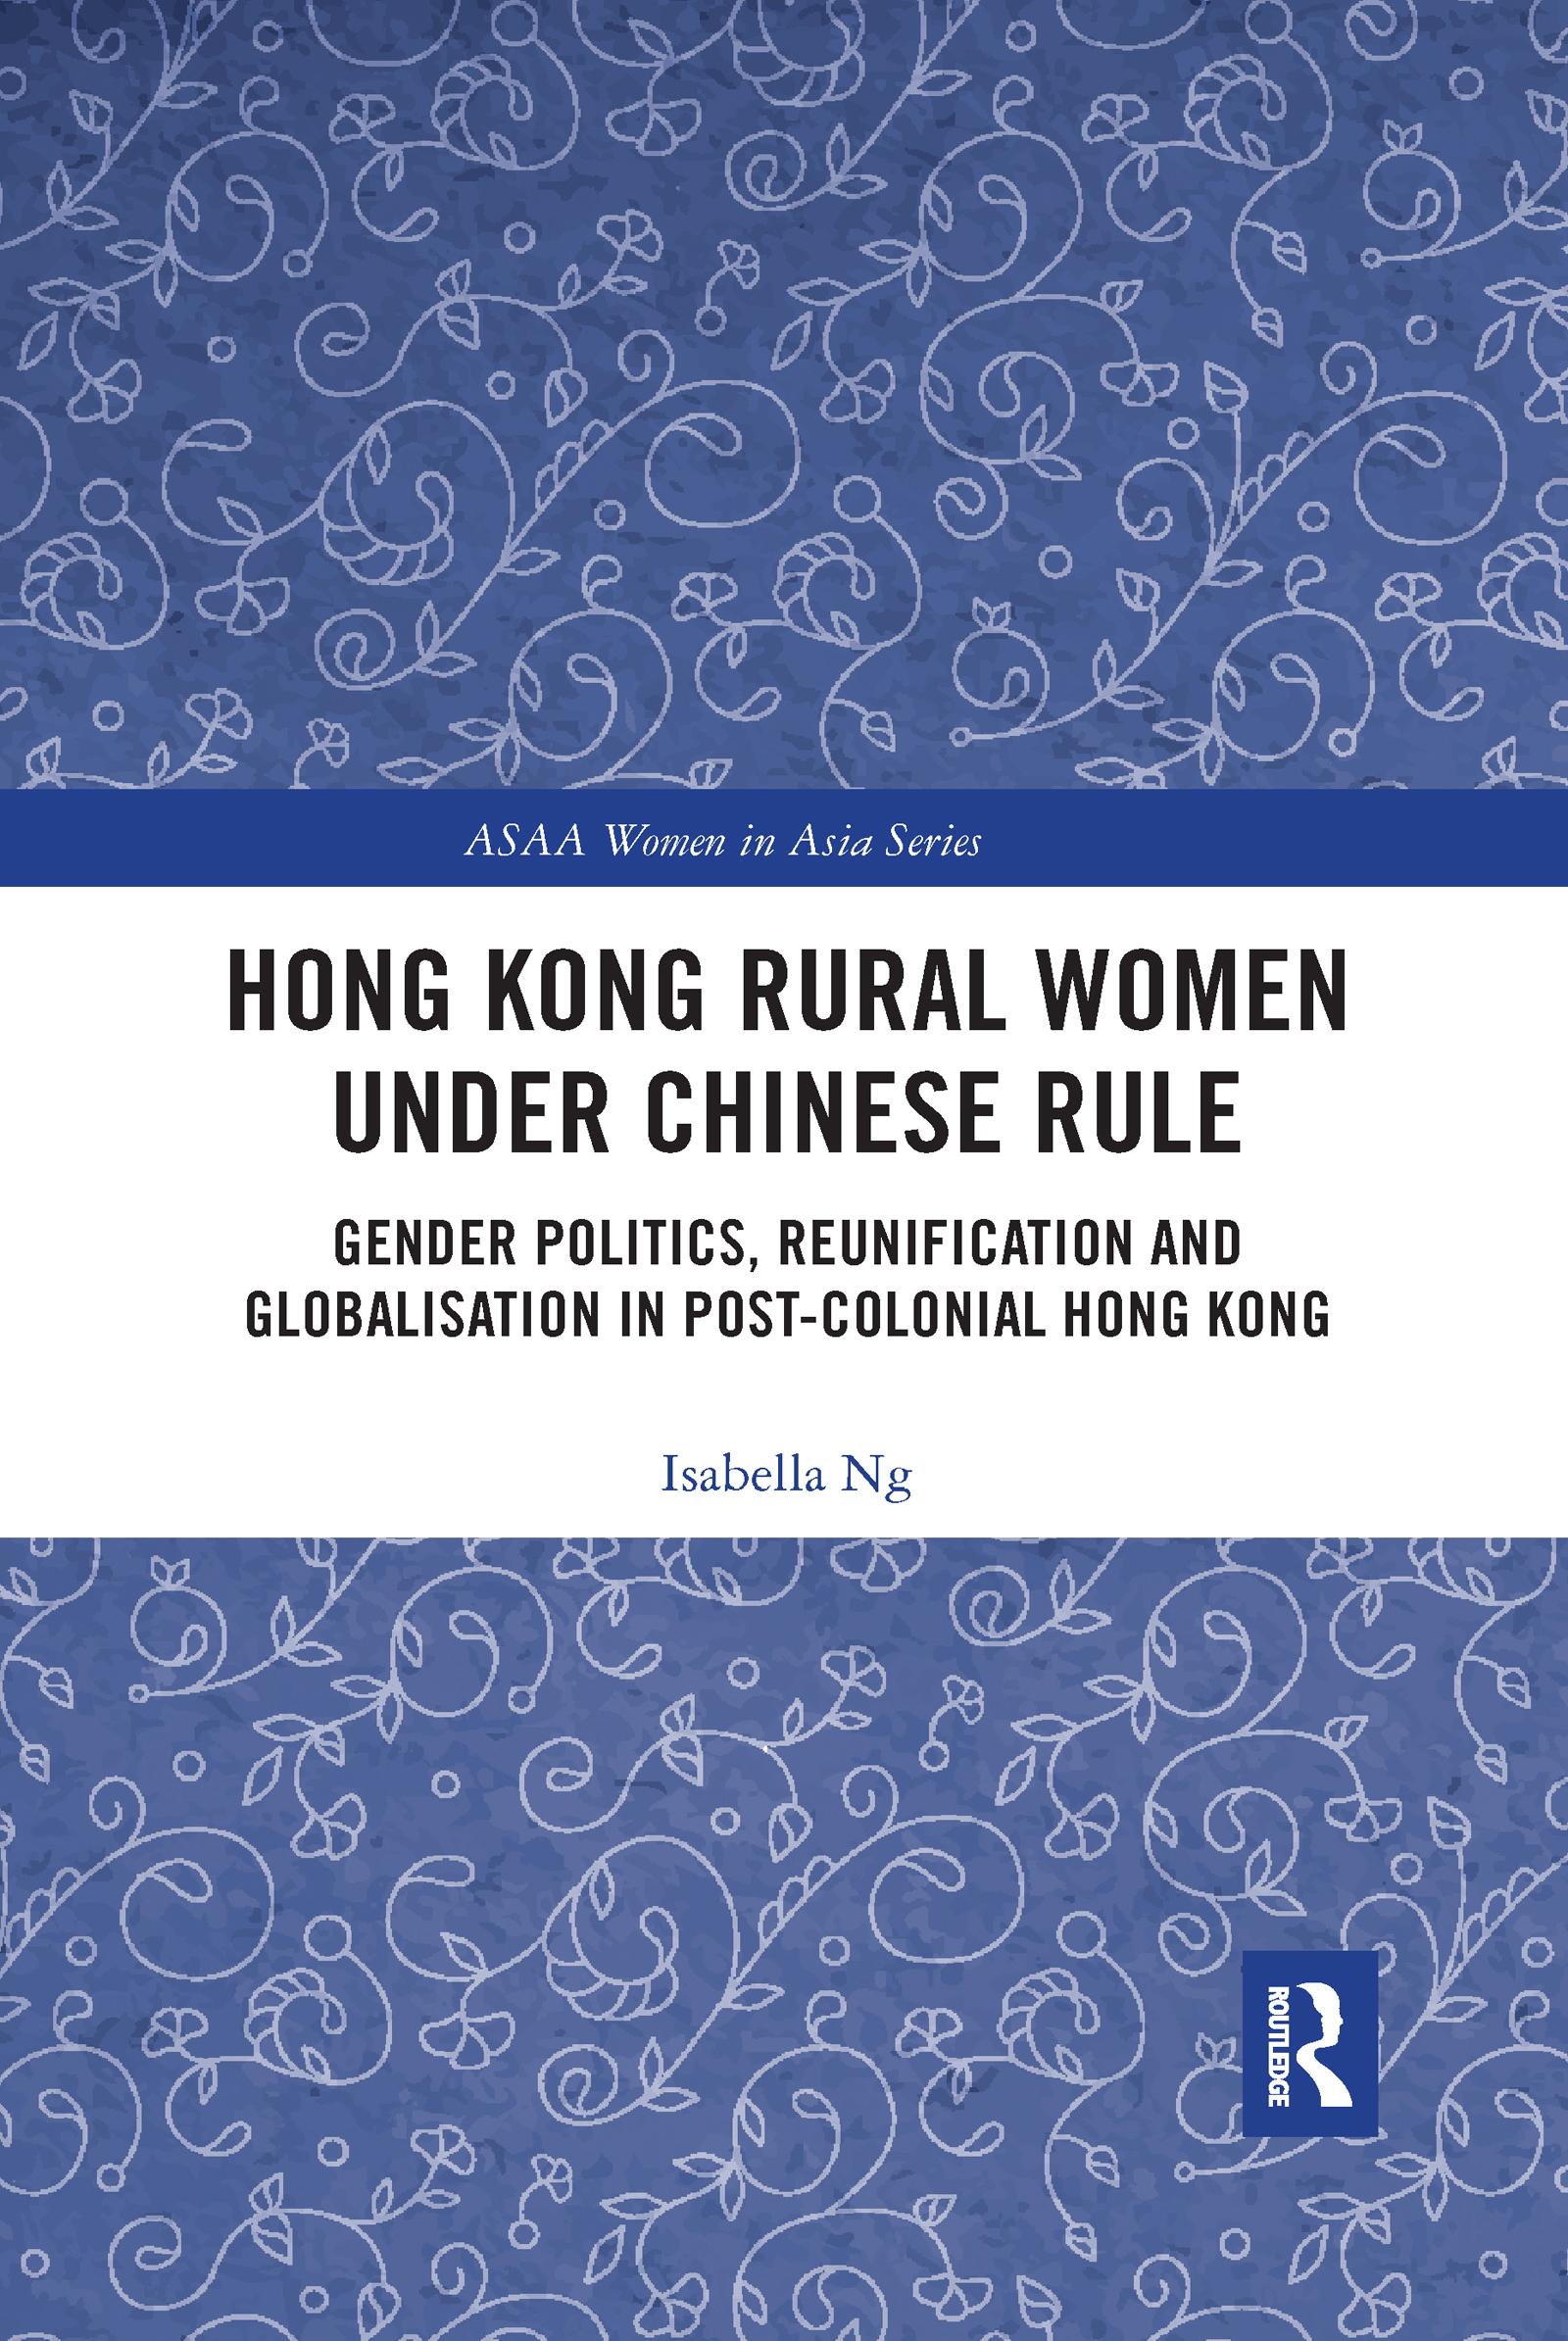 Hong Kong Rural Women under Chinese Rule